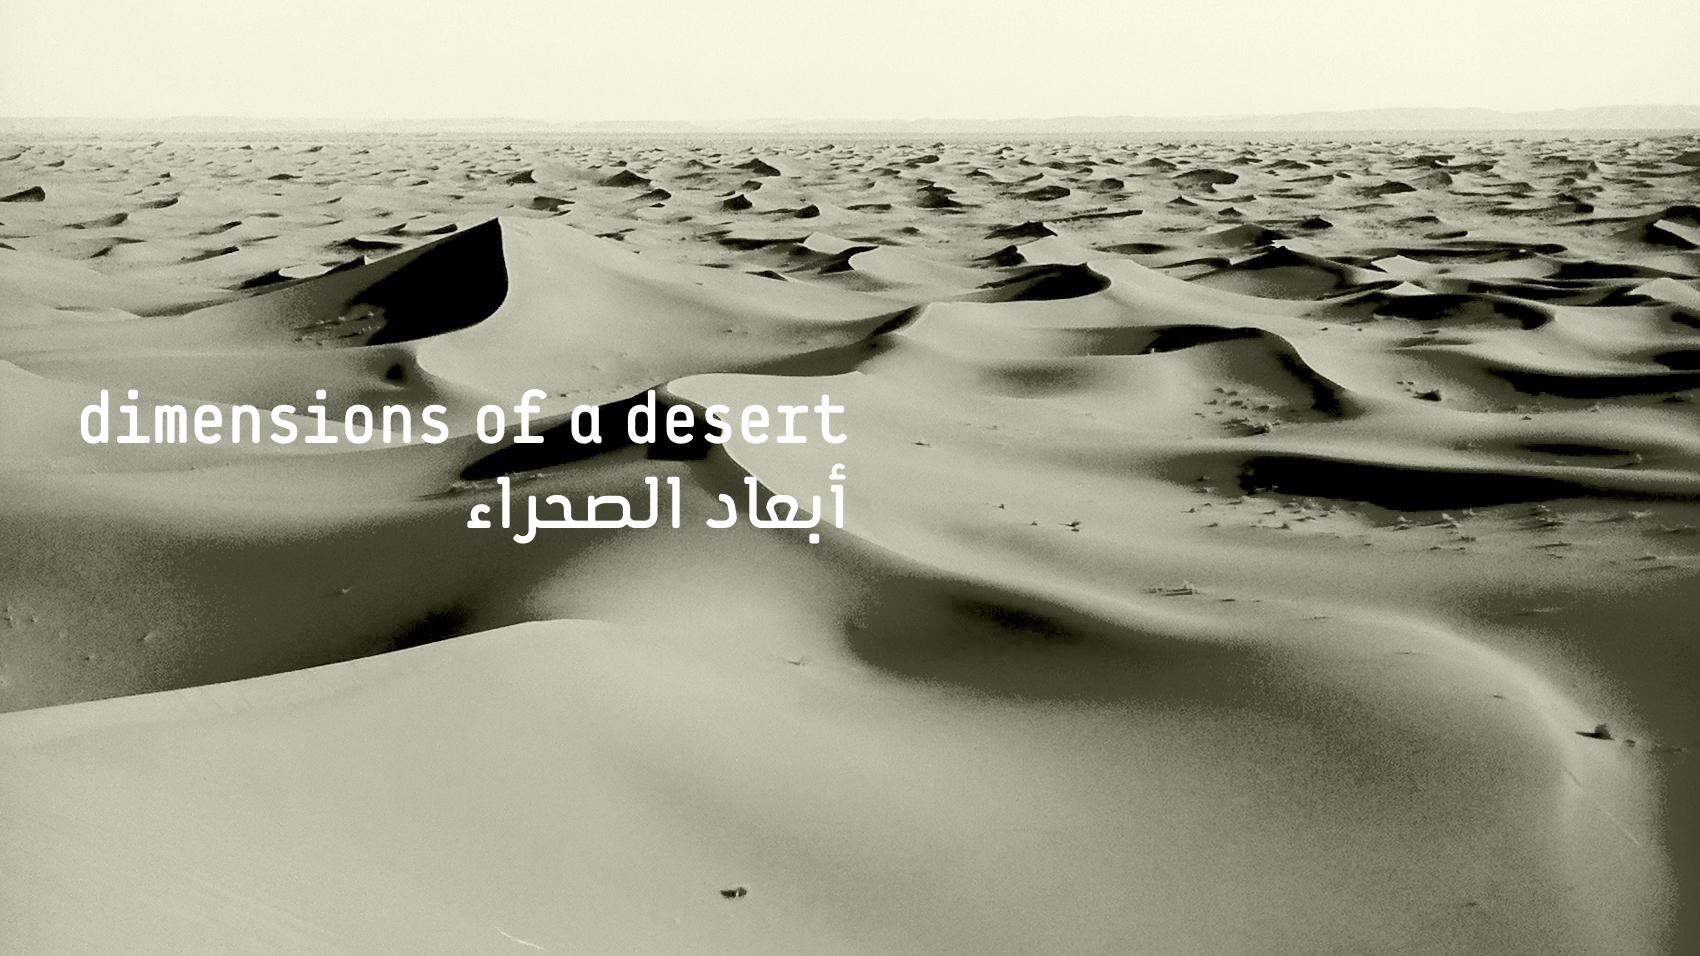 dimensions of a desert.jpg